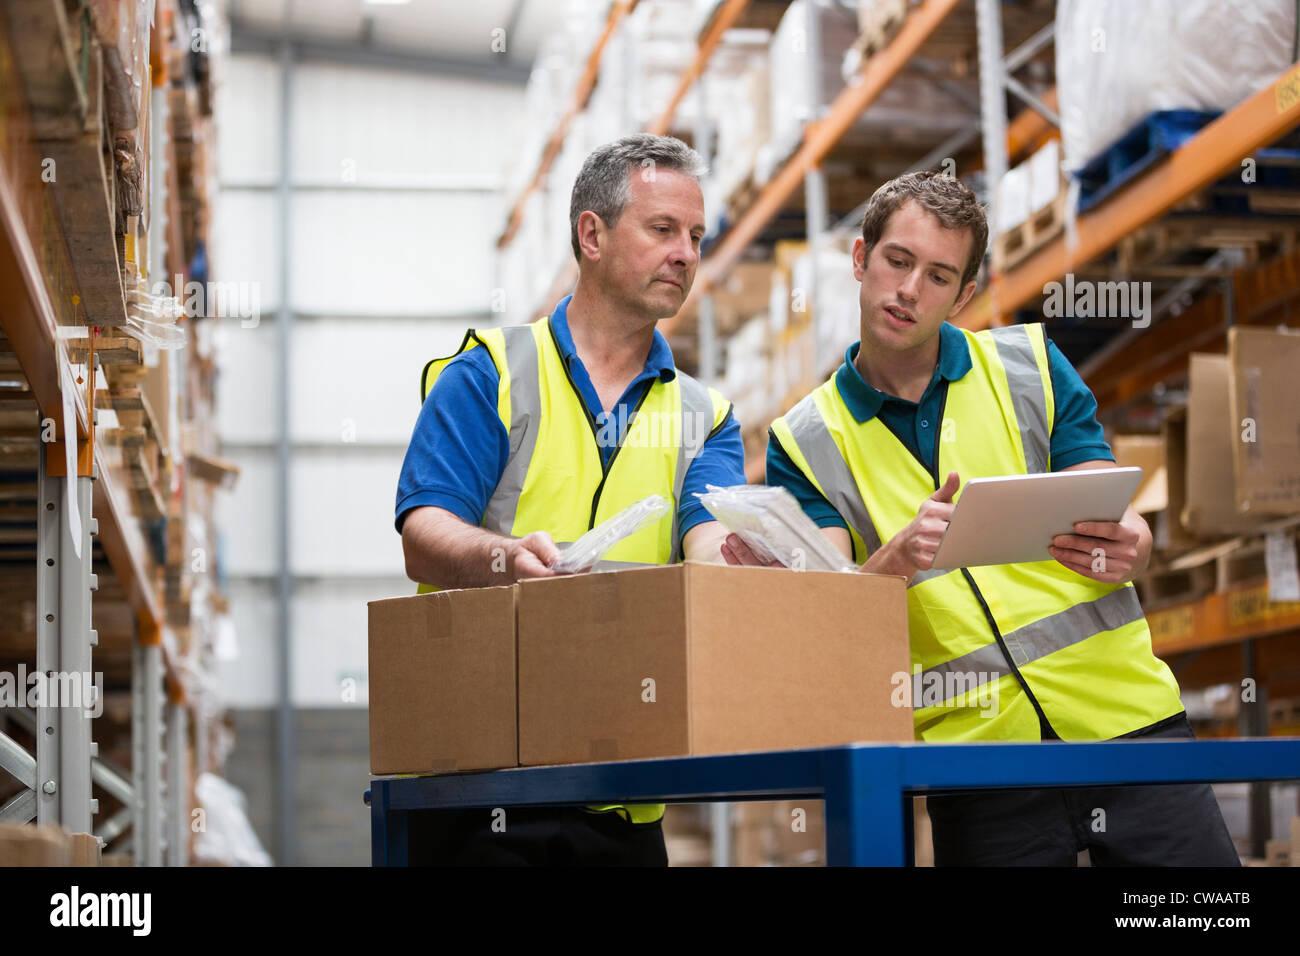 Dos hombres controlar las existencias en almacén Imagen De Stock